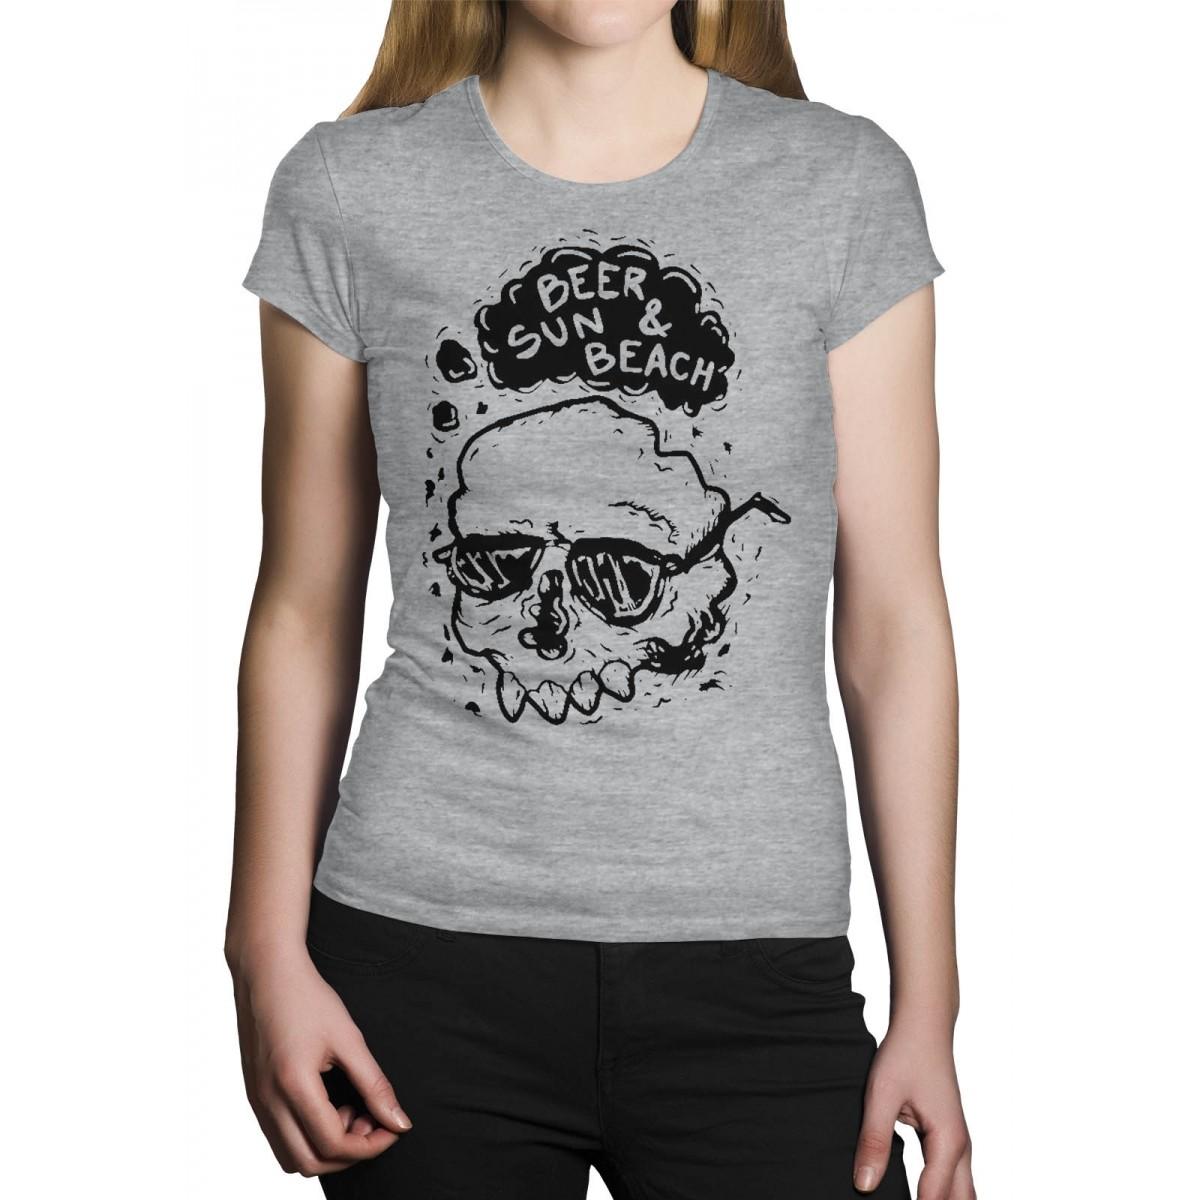 Camiseta HShop Beer Sun - Cinza Mescla  - HShop